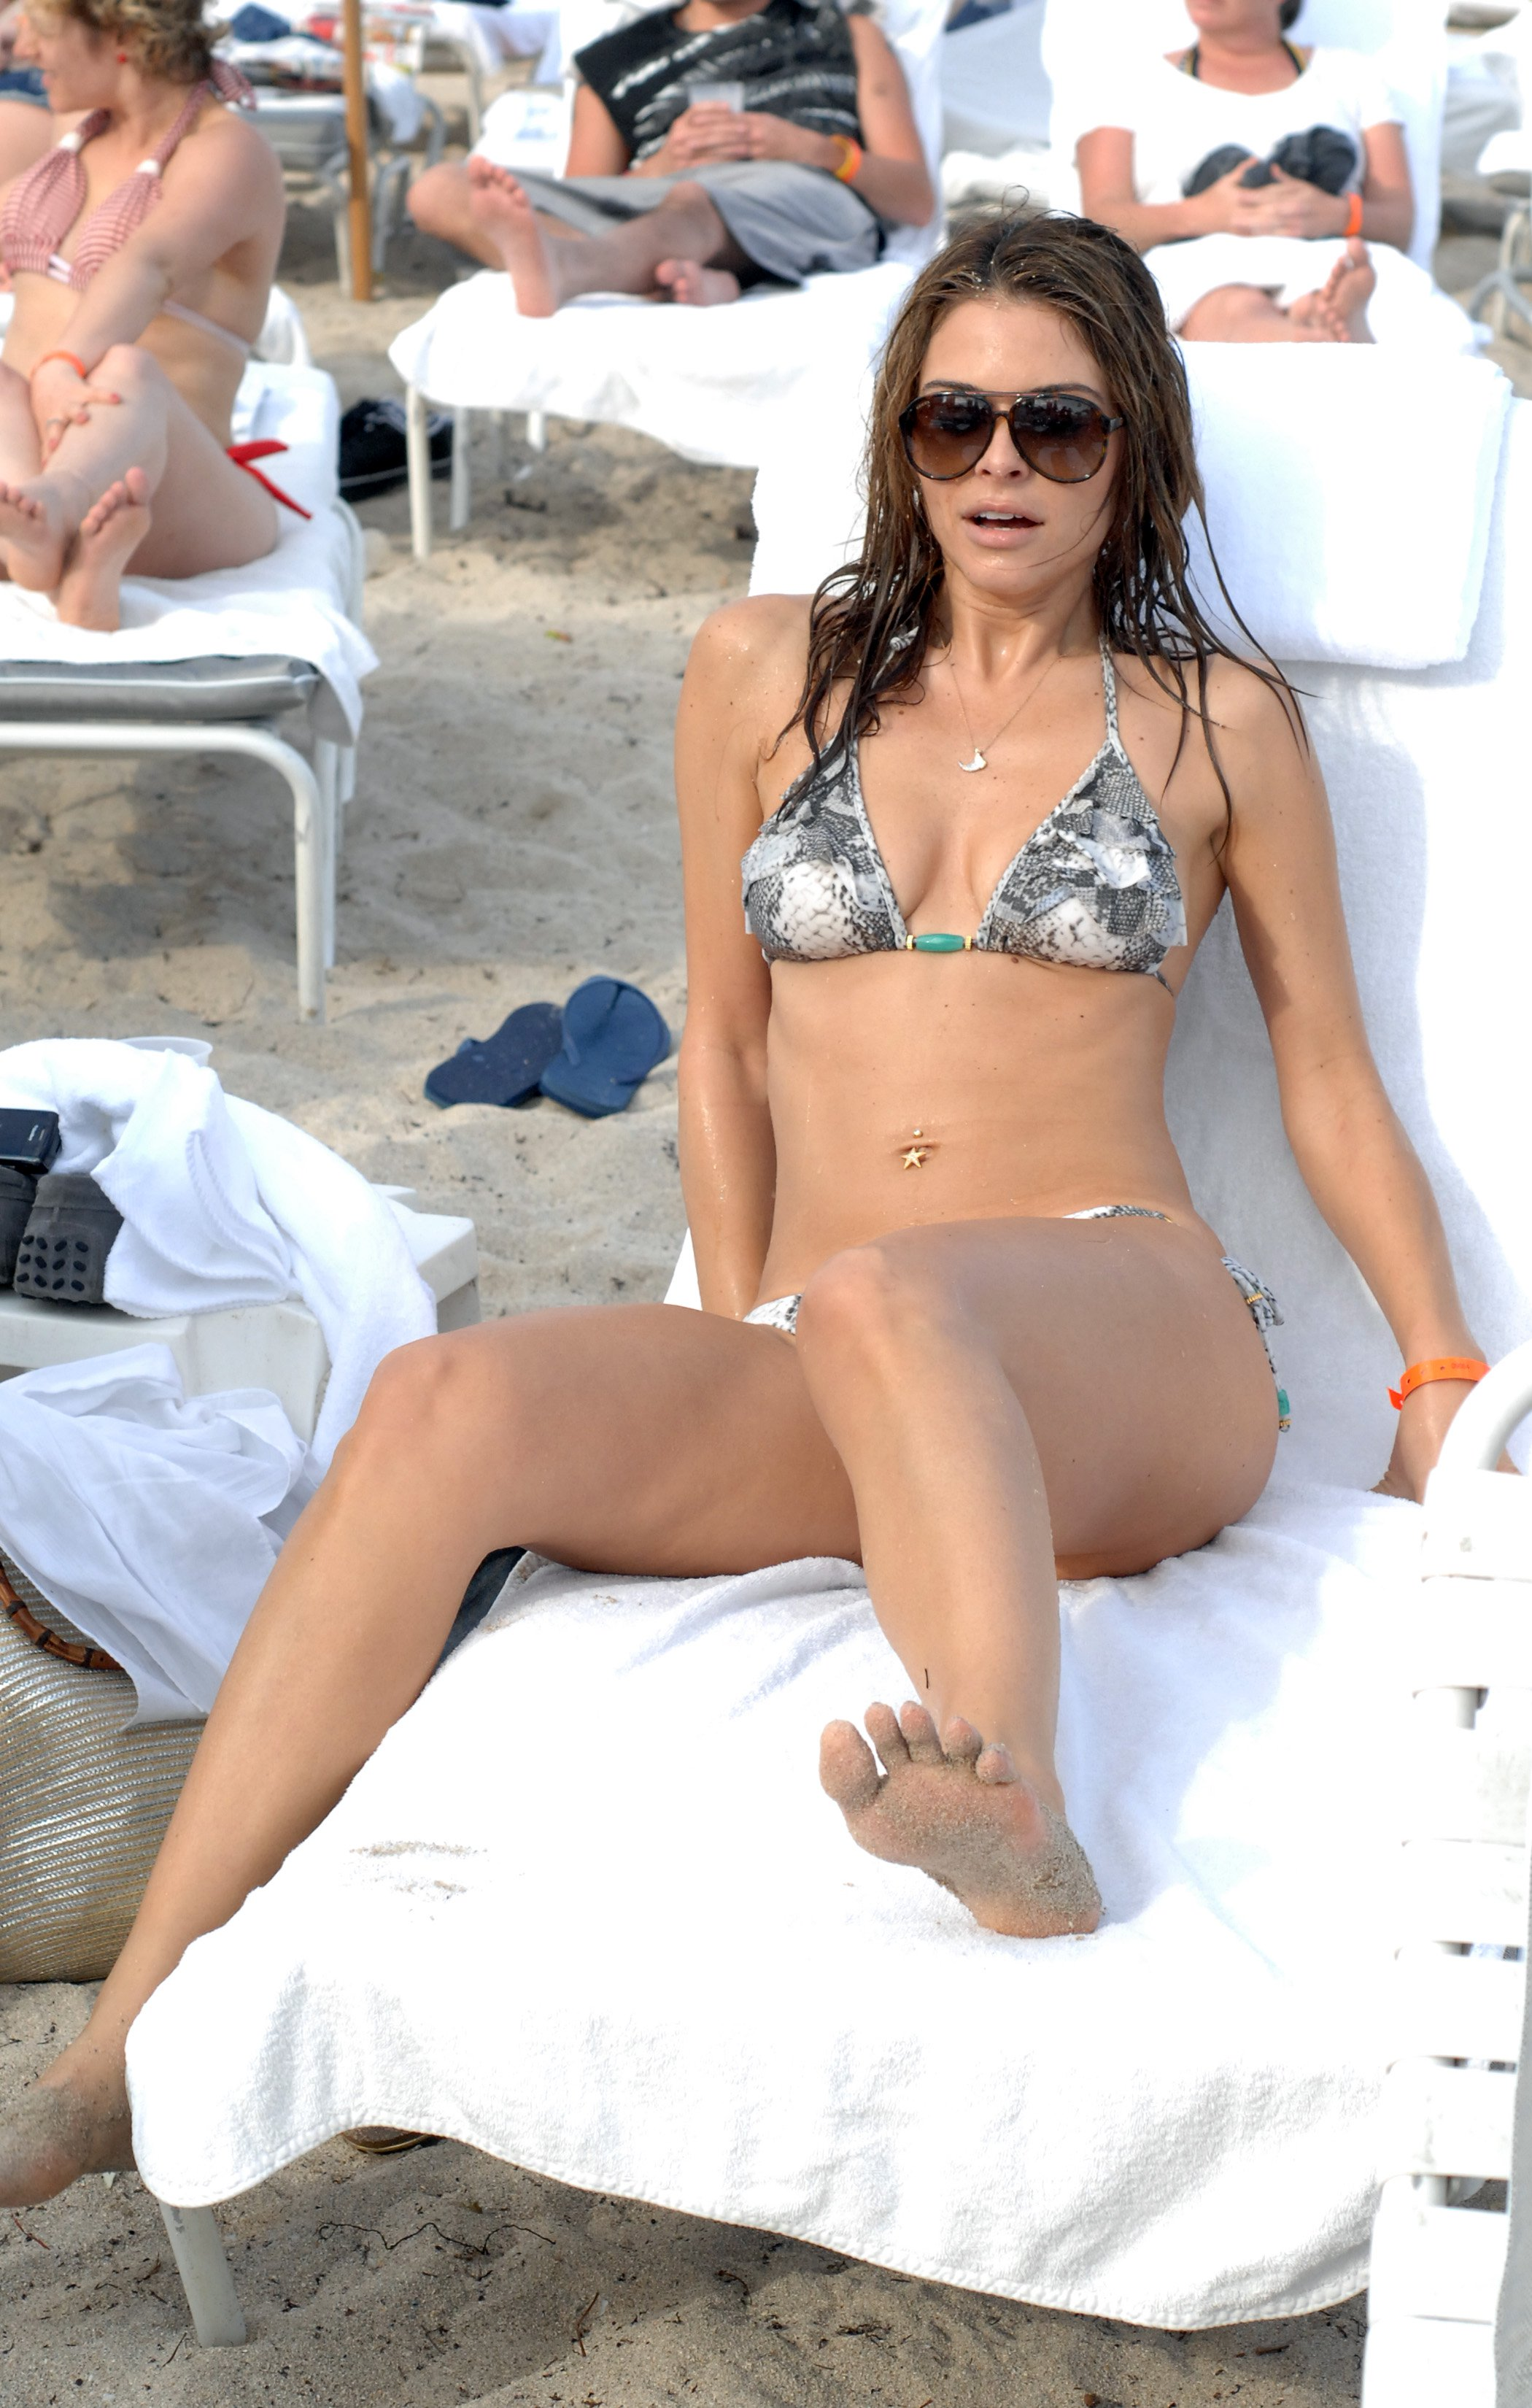 Maria Menounos Shows Off Her Hot Bikini Body On Beach